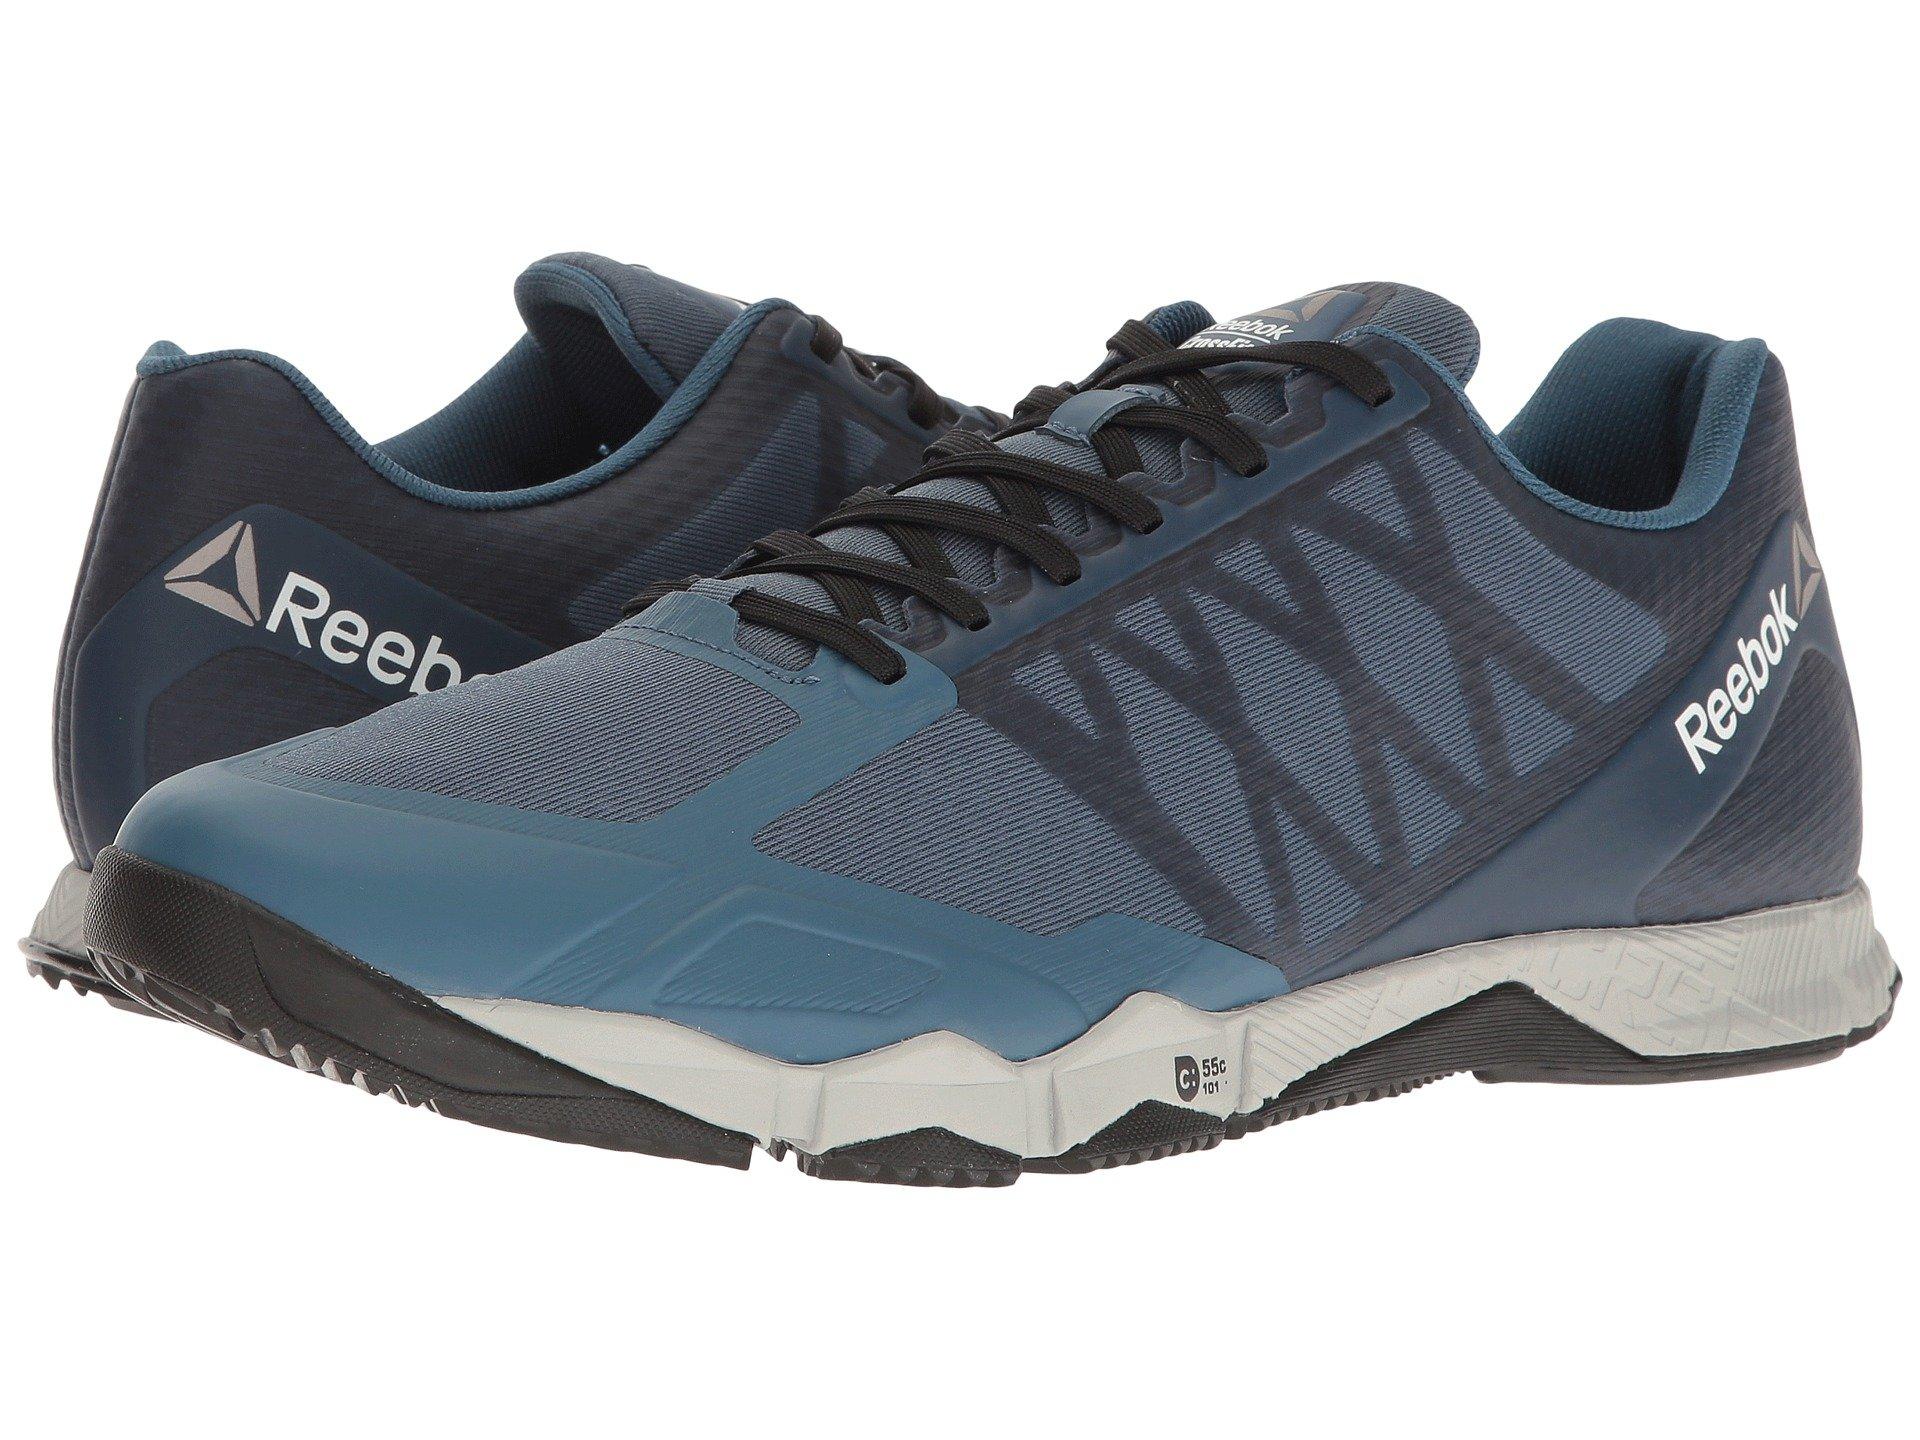 REEBOK Crossfit® Speed Tr, Brave Blue/Skull Grey/Black/White/